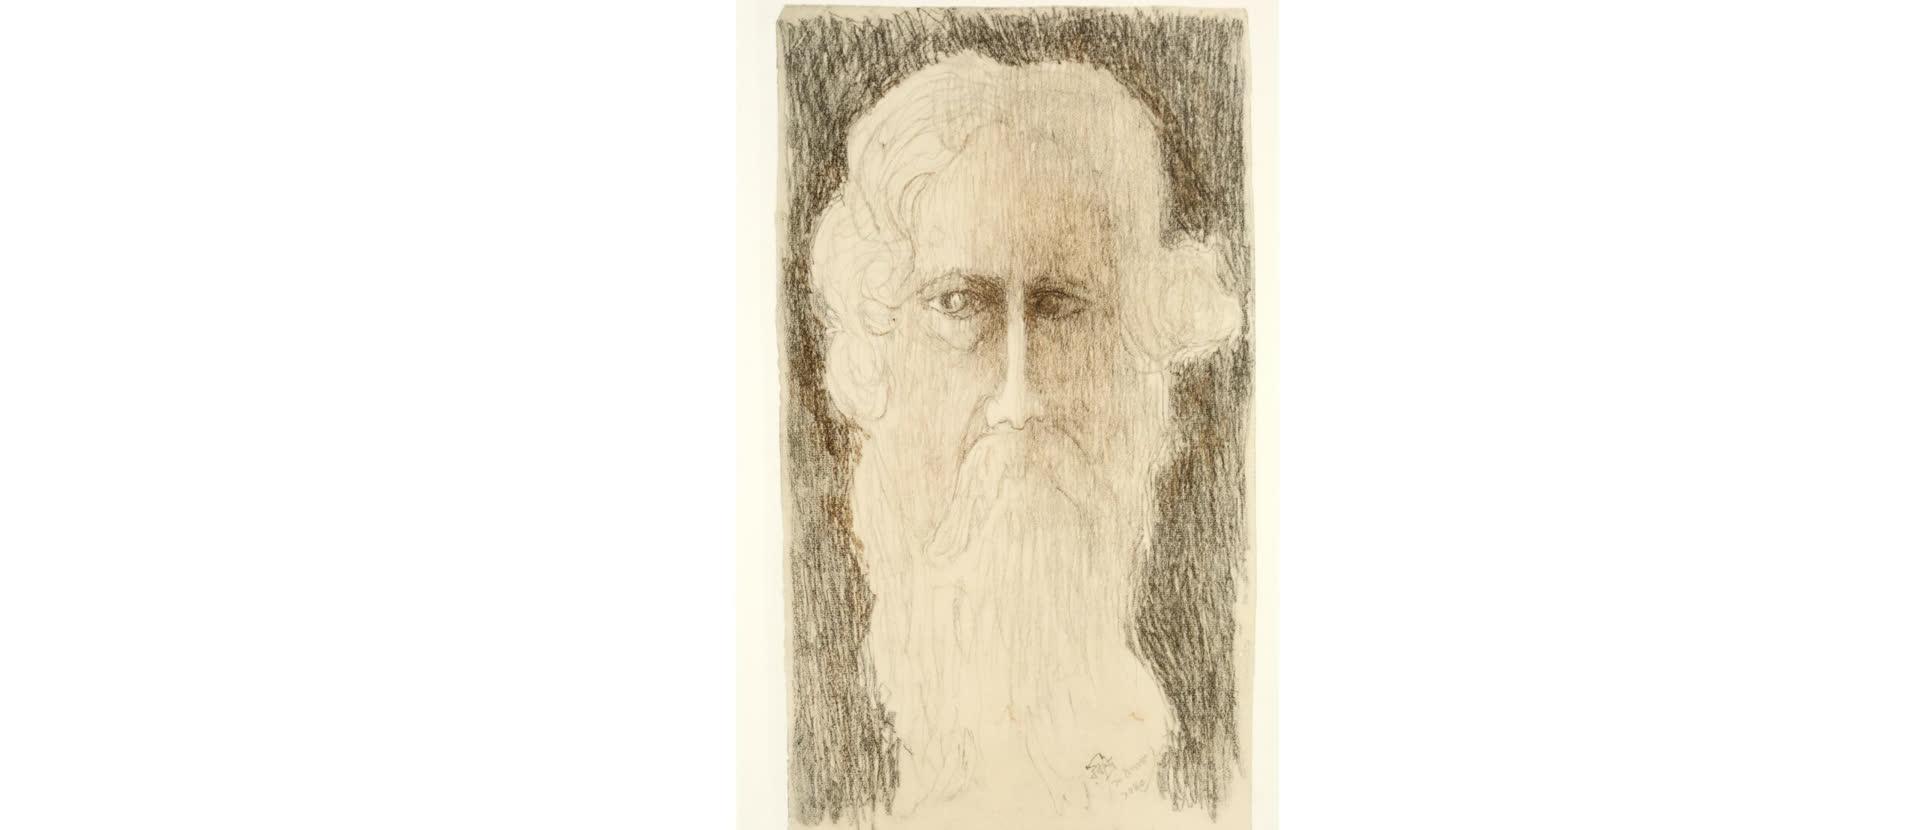 Rabindranath Tagore, the Artist